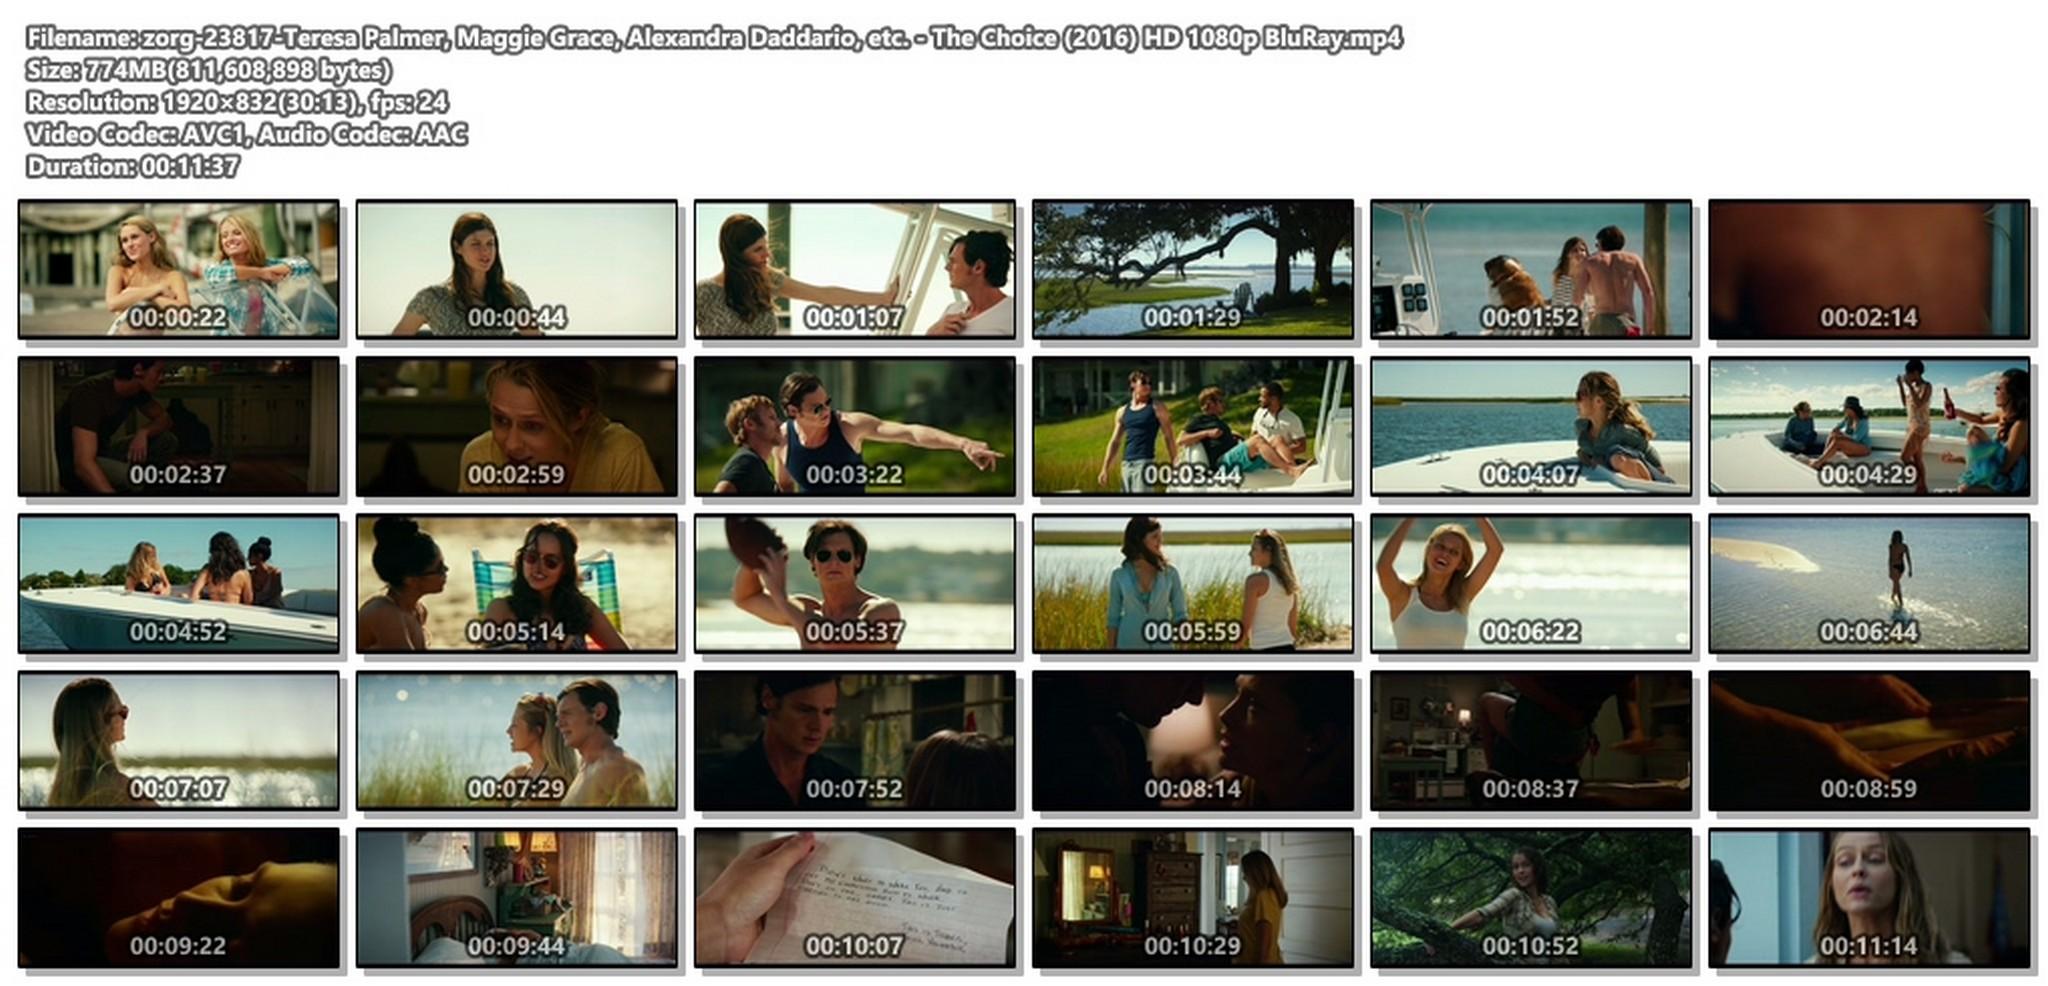 Teresa Palmer hot bikini and Maggie Grace, Alexandra Daddario hot too - The Choice (2016) HD 1080p BluRay (1)